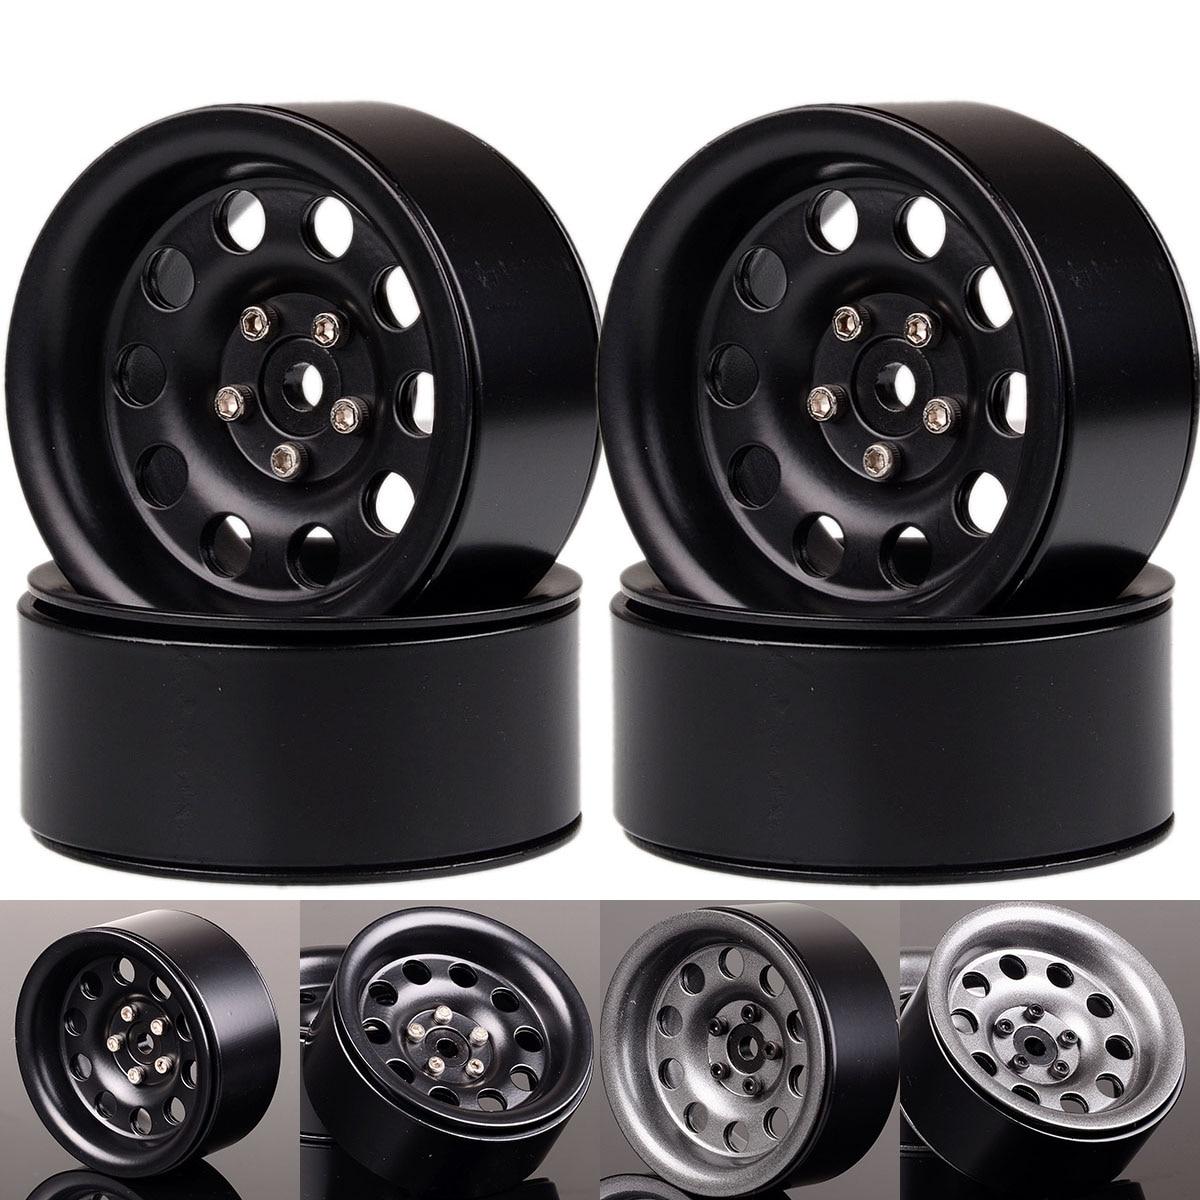 "NEW ENRON 4P 2.2 ""Metal  Beadlock Wheel Rims Hub for SCX10 RR10 90053 AX10 Aro para 1/10 RC Crawler Axial Wraith 90056 90045"